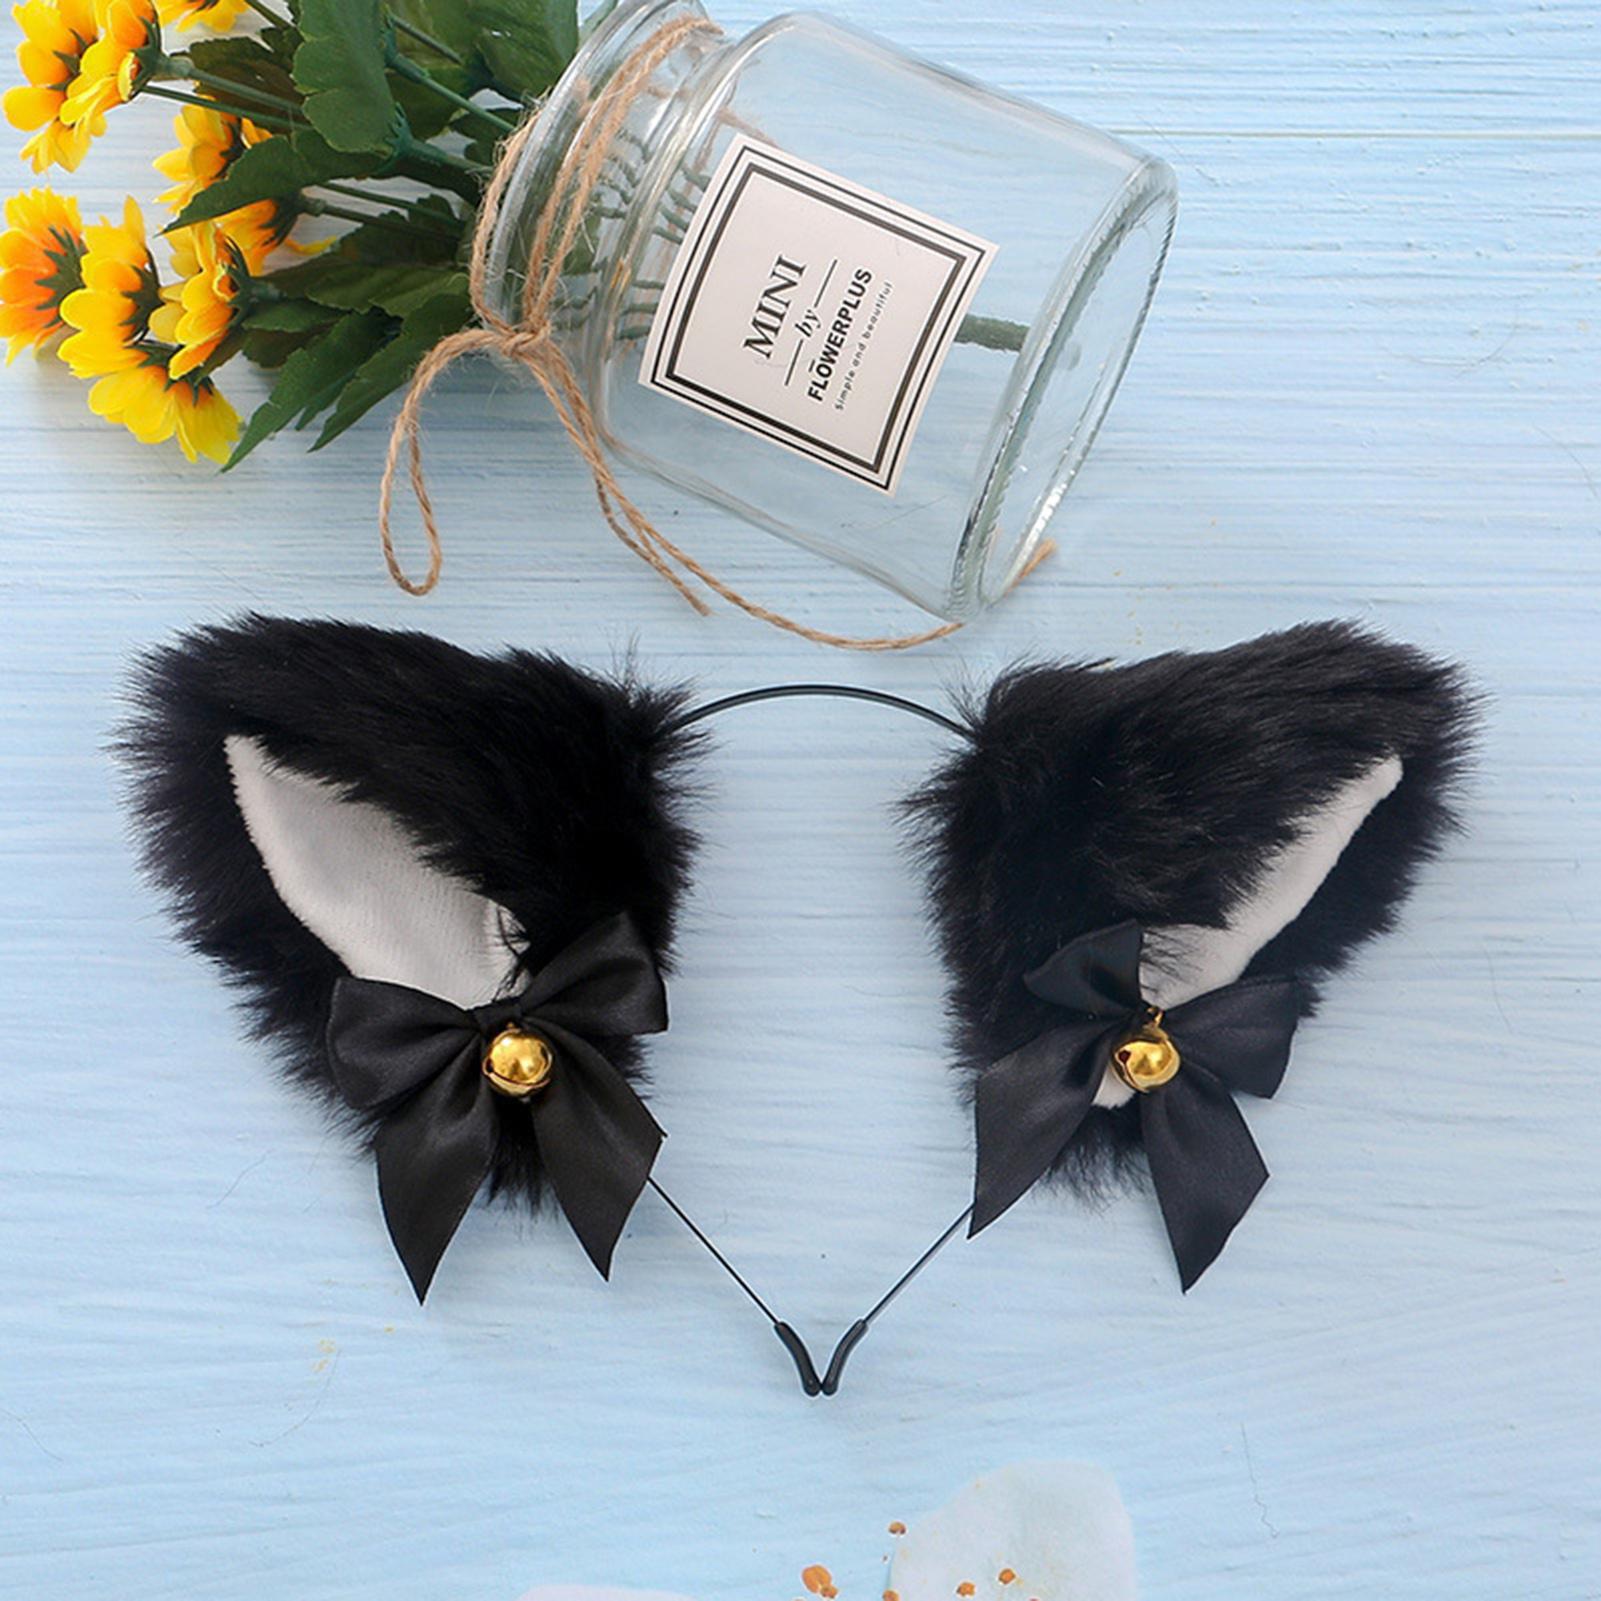 Details about  /Party Club Bar Cat Ear Head Band Hair Accessories Small bell Cartoon Hair Band